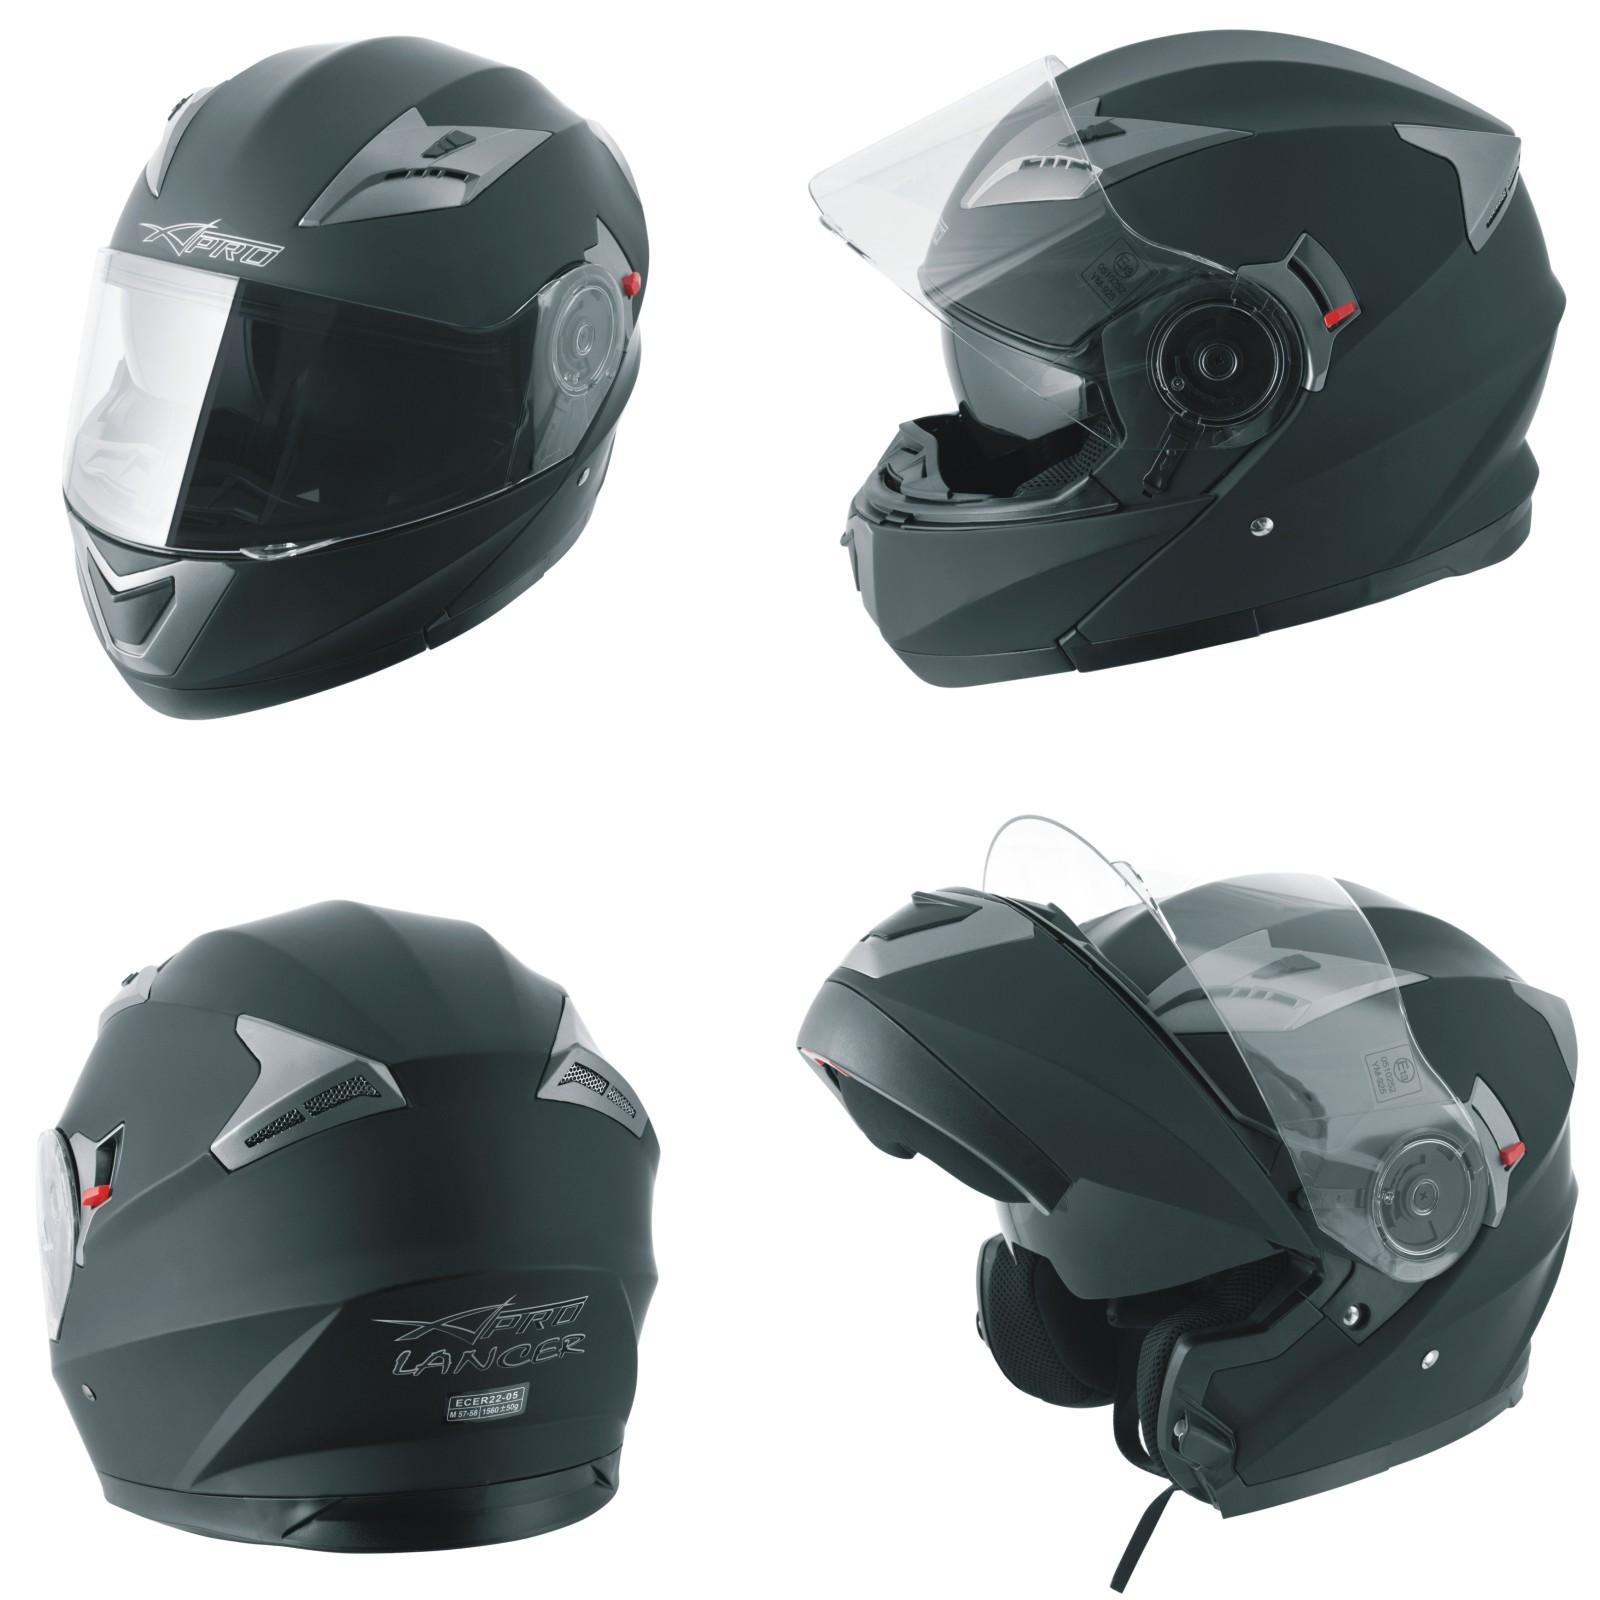 Casco Modulare Apribile Moto Touring Sport Visiera Parasole Nero opaco